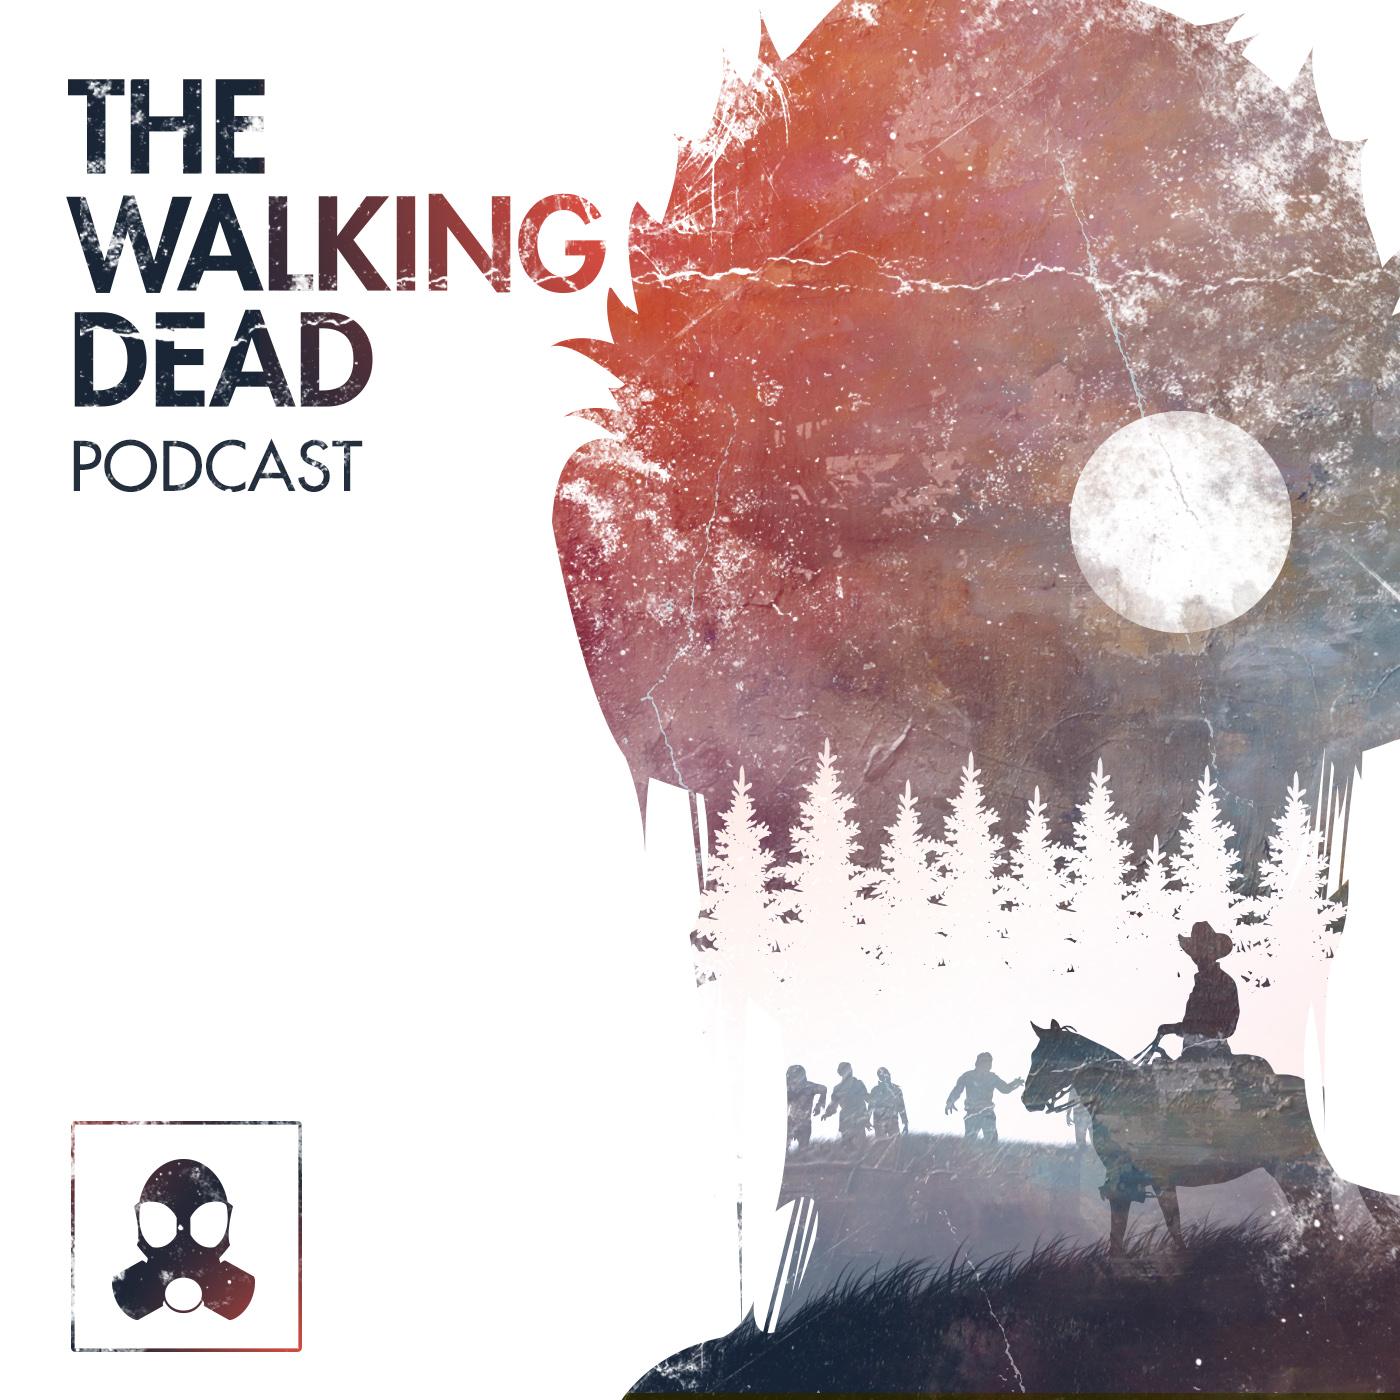 Artwork for podcast The Walking Dead Podcast